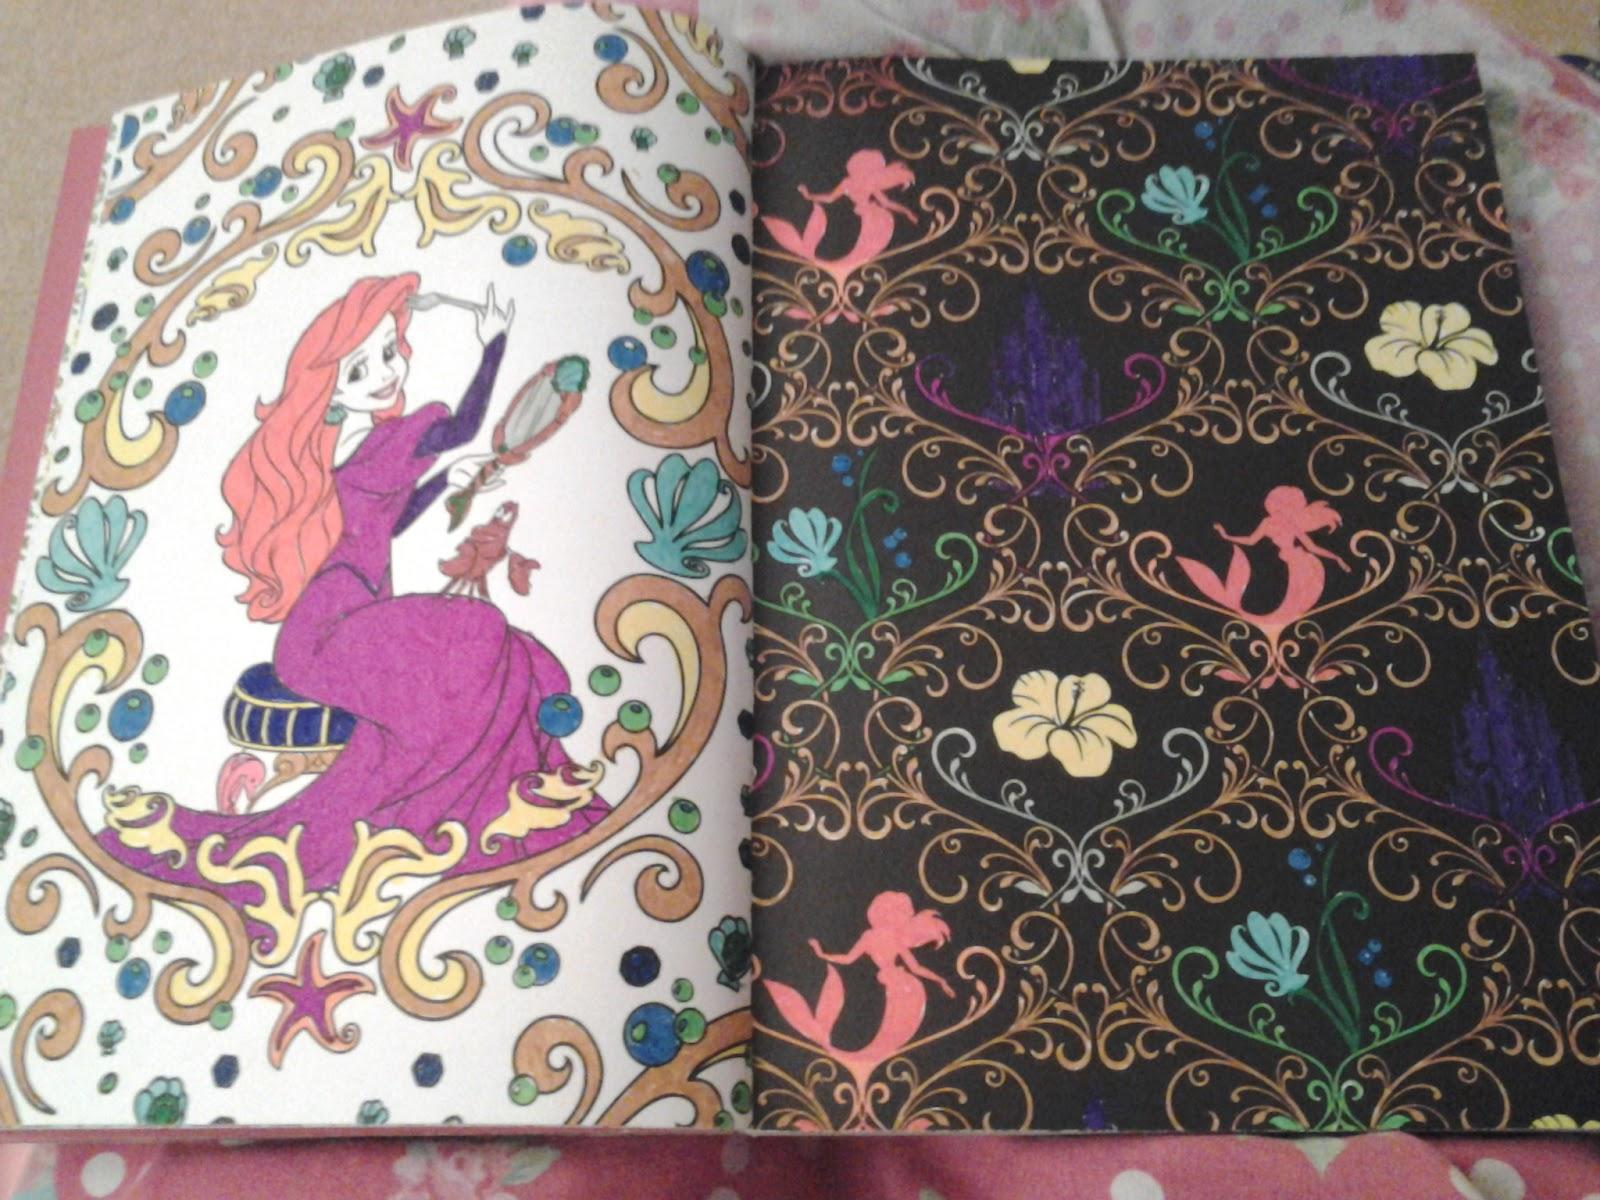 Ive Been Having Fun Decorating Tiaras And Bringing Colour To Both Ariel Mulan In My Disney Princess Art Therapy Book